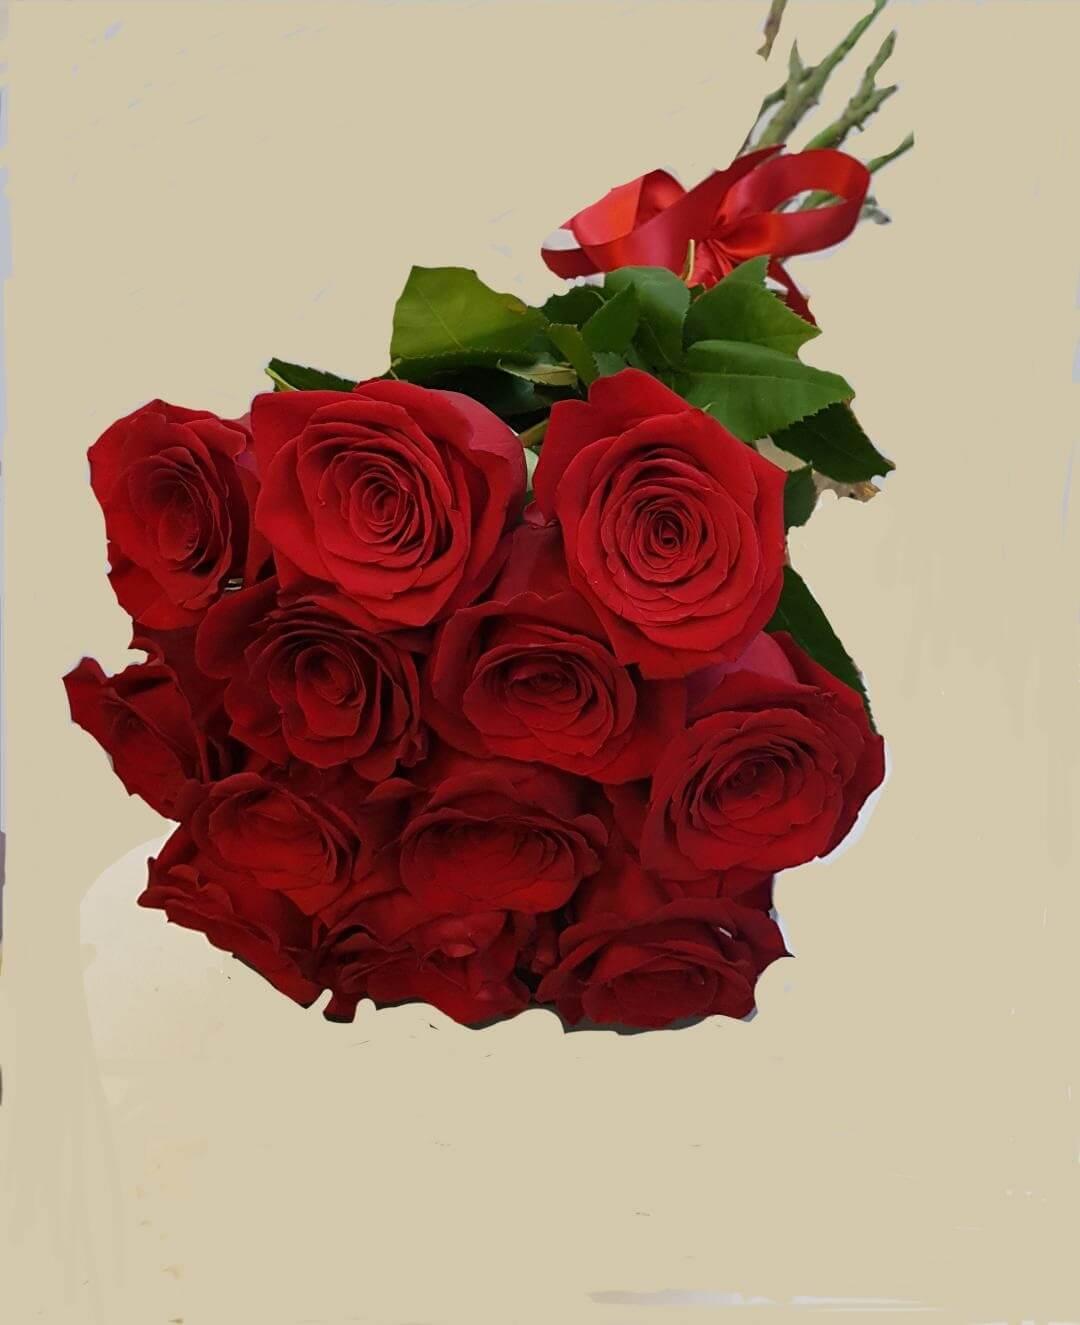 Fascio 50 Rose Rosse | PassioneFiori.it Fiori freschi a